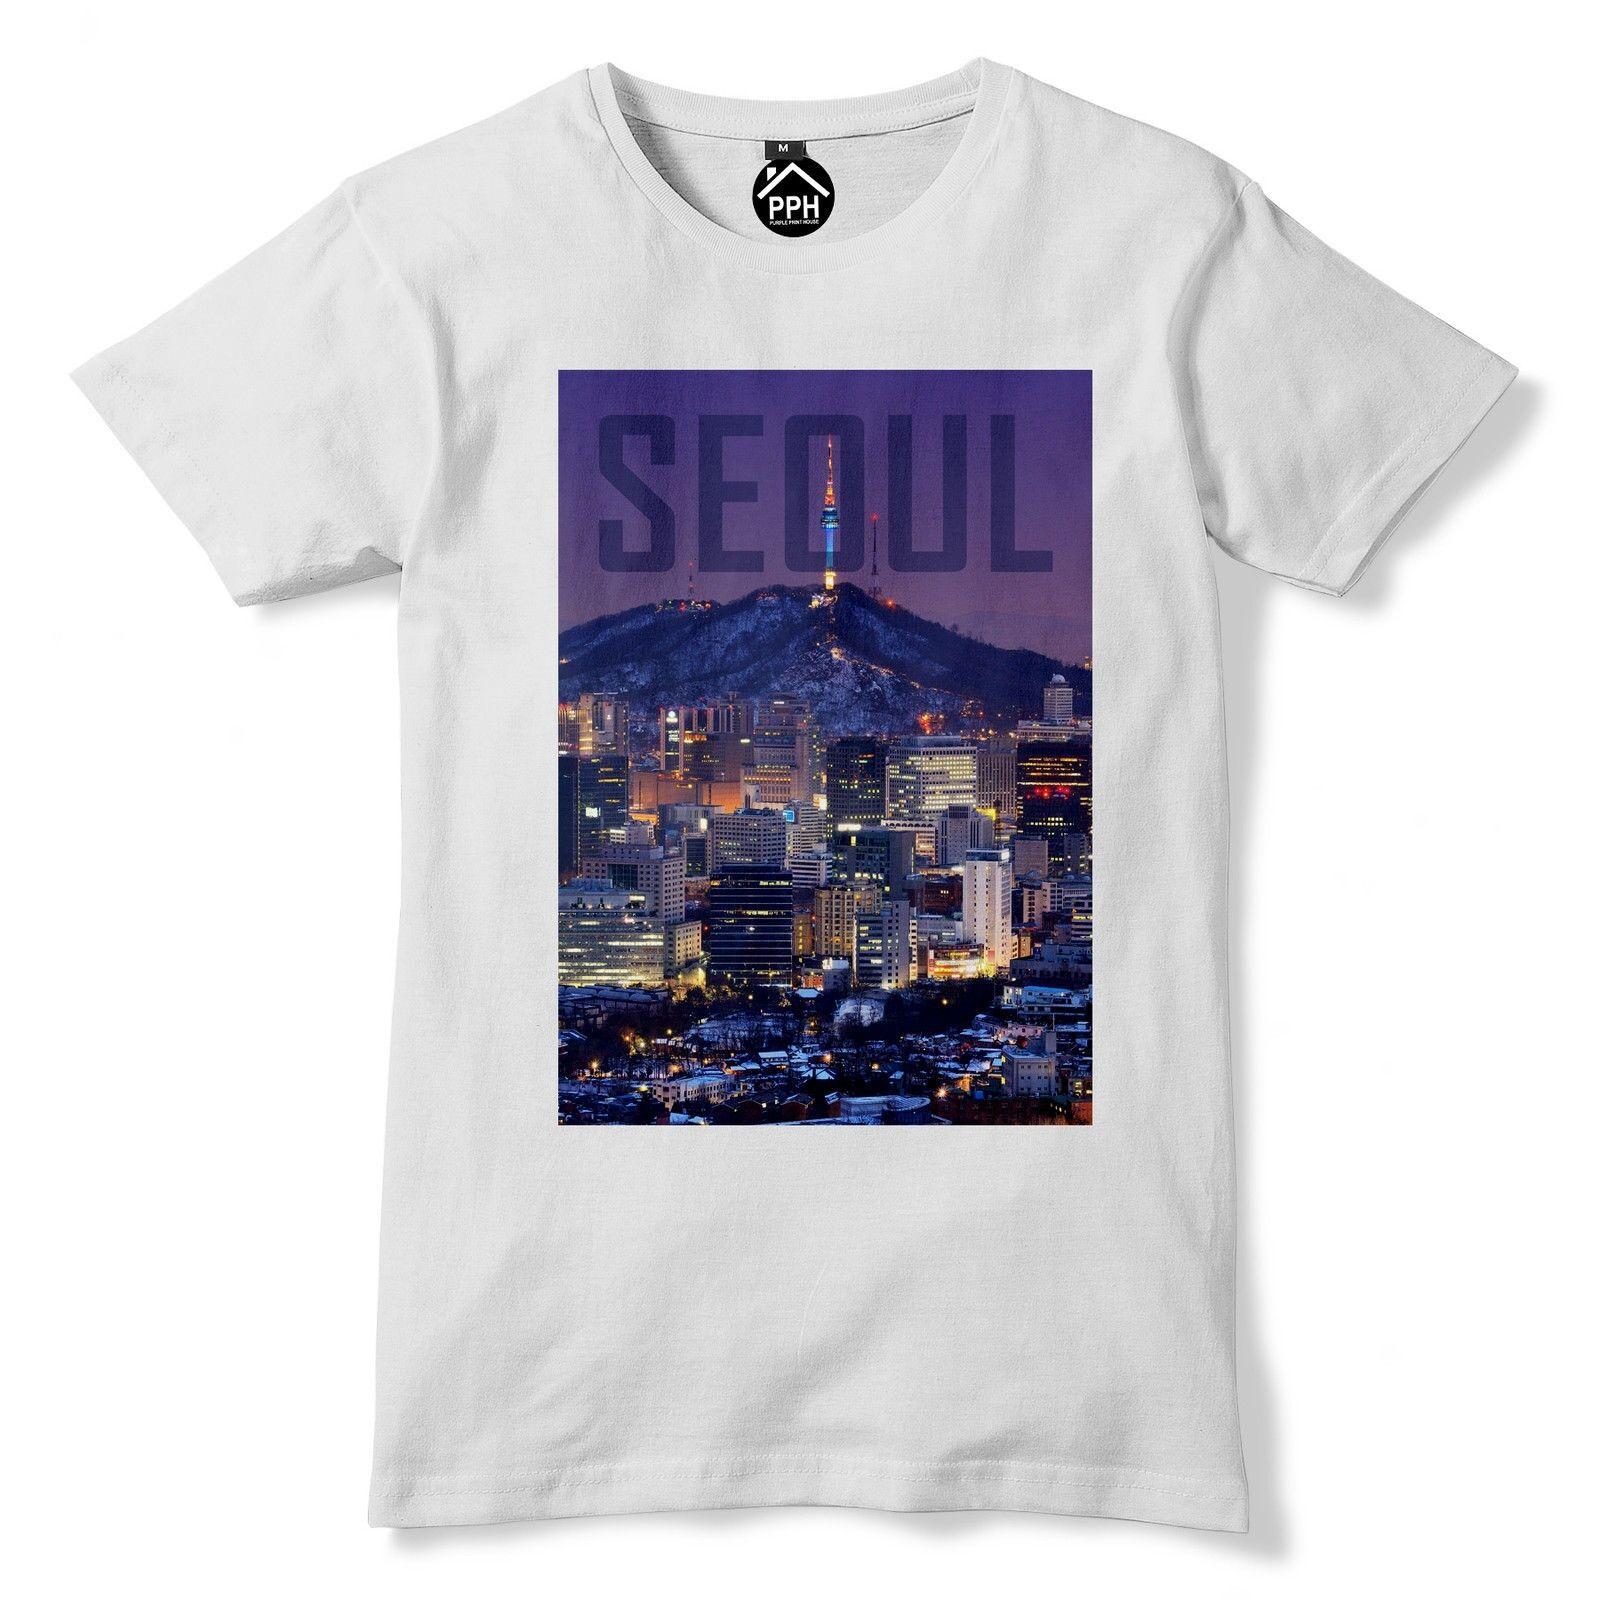 Camiseta Seoul Corea del Sur camiseta Asia Top paisaje urbano rascacielos Dongdaemun 154 envío gratis camiseta de moda estilo hombres